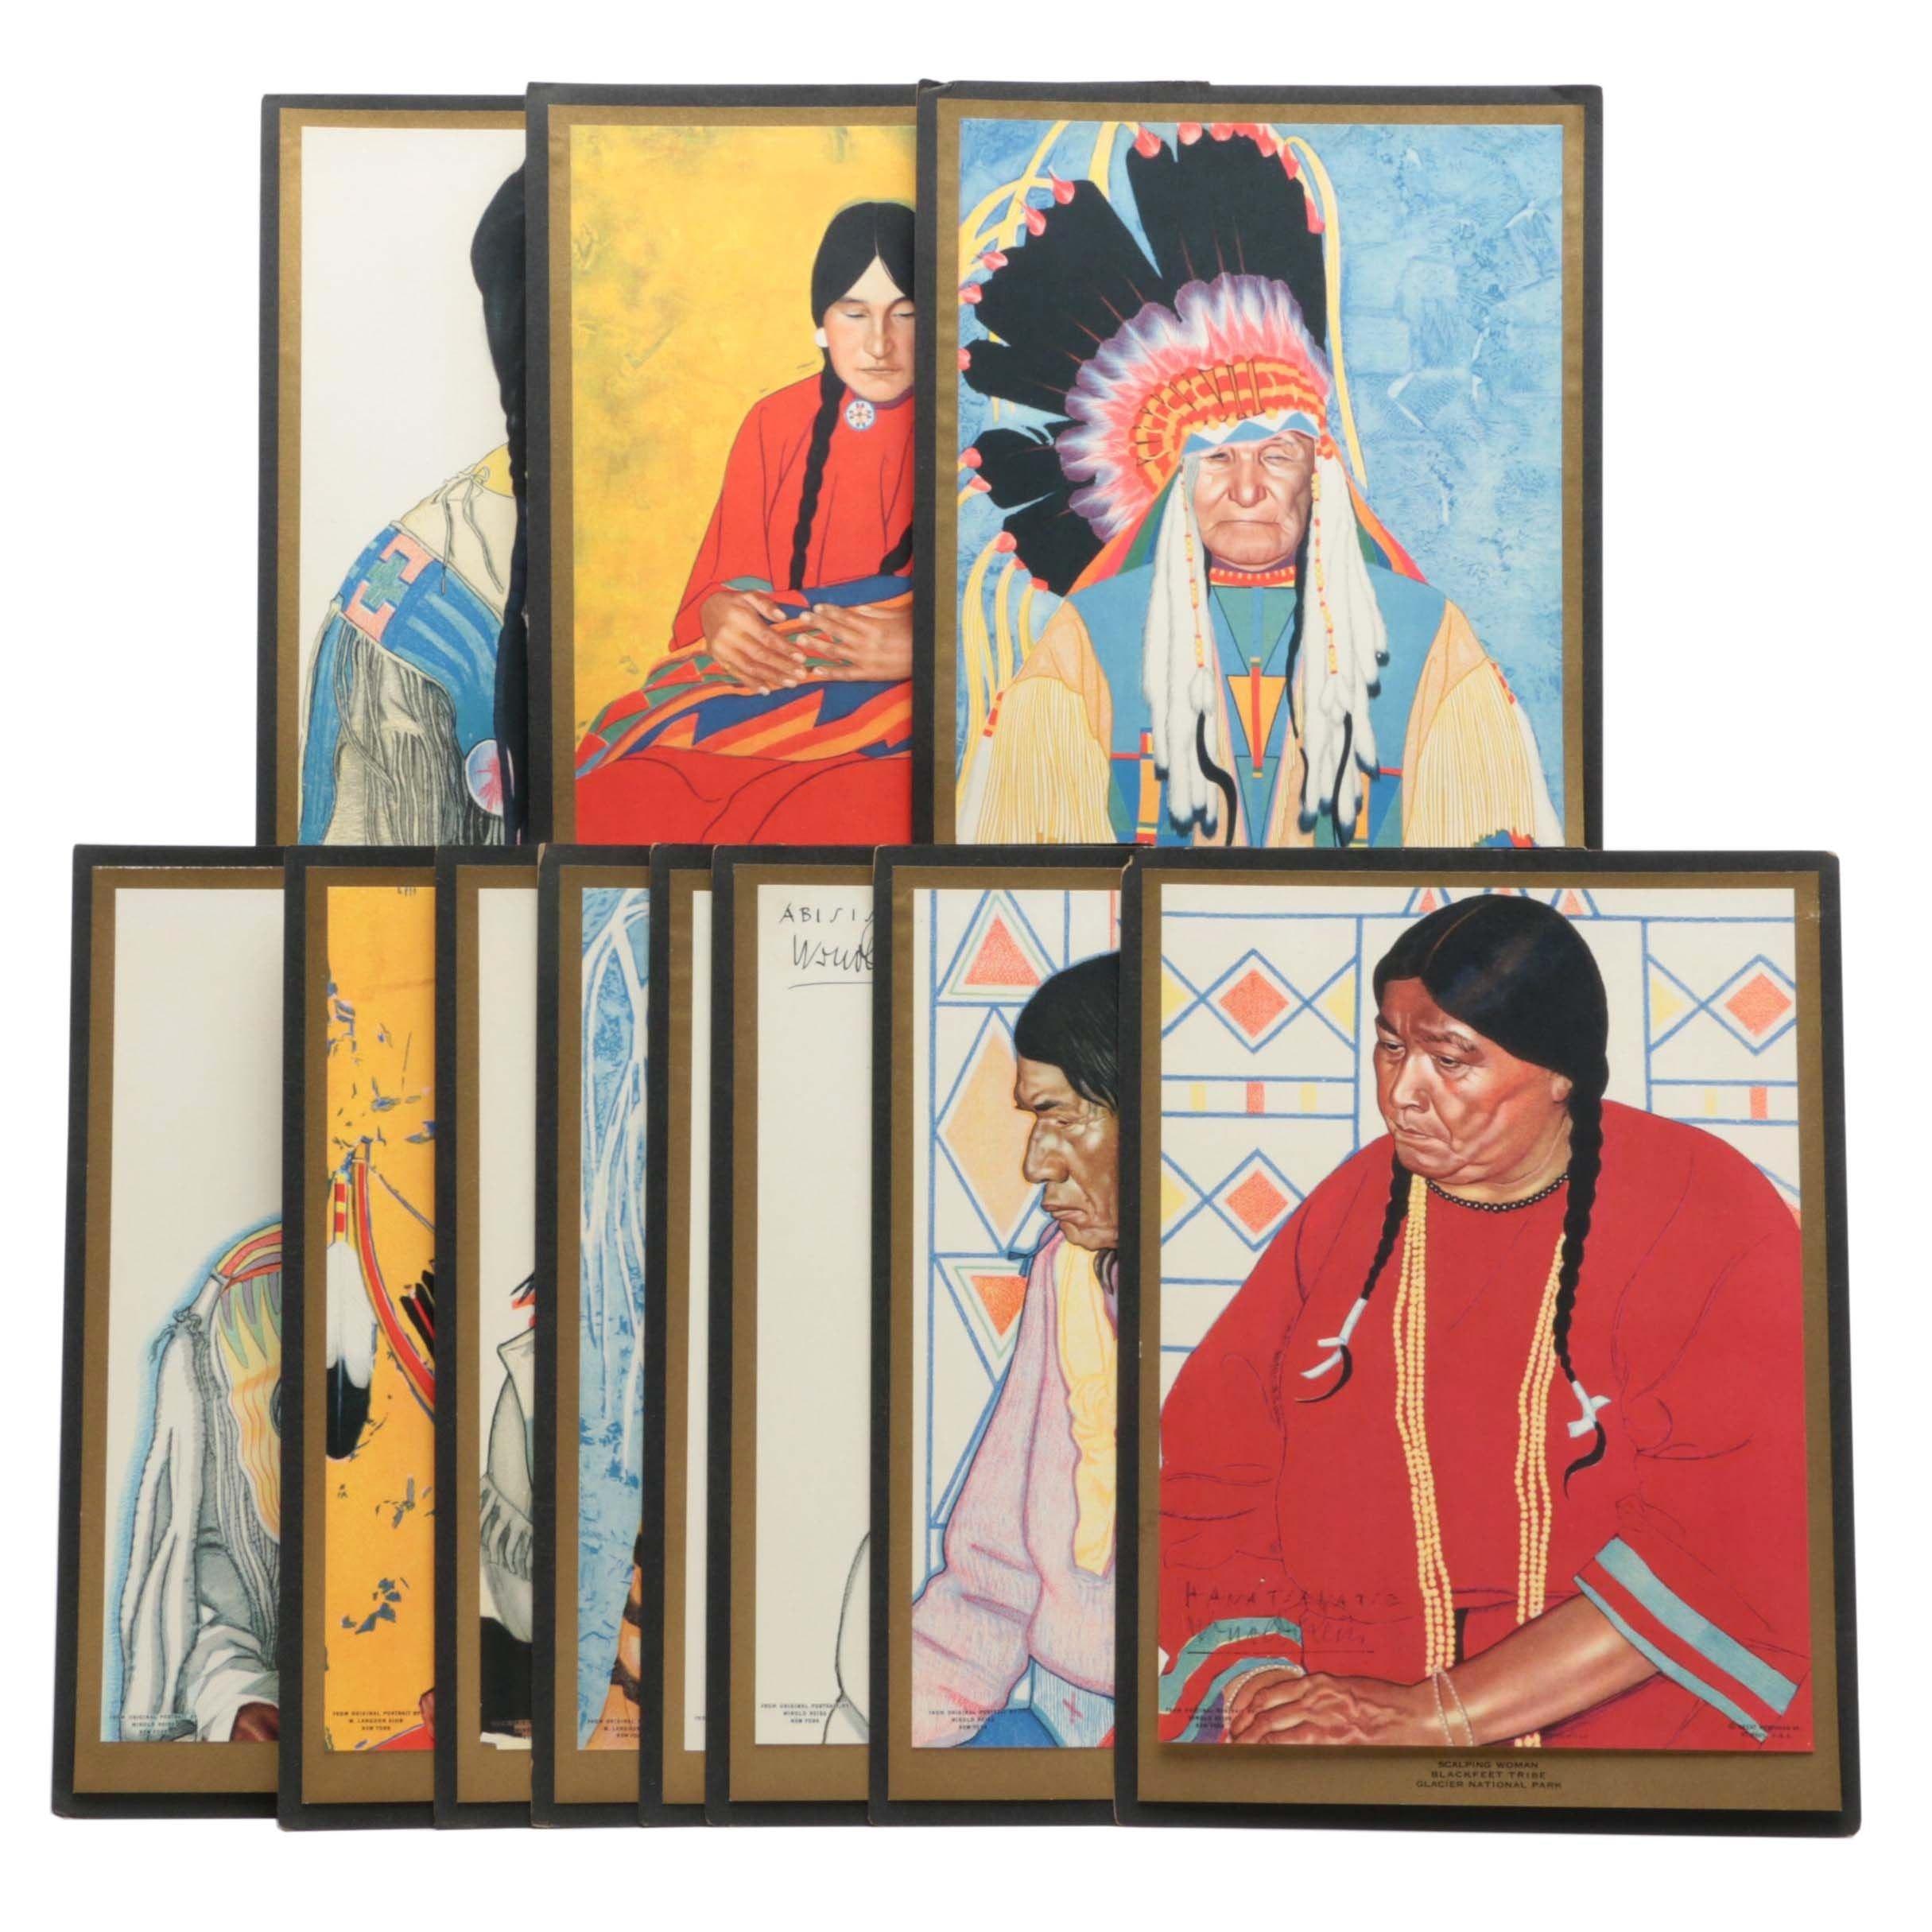 Group of Blackfeet Tribe Portrait Lithographs